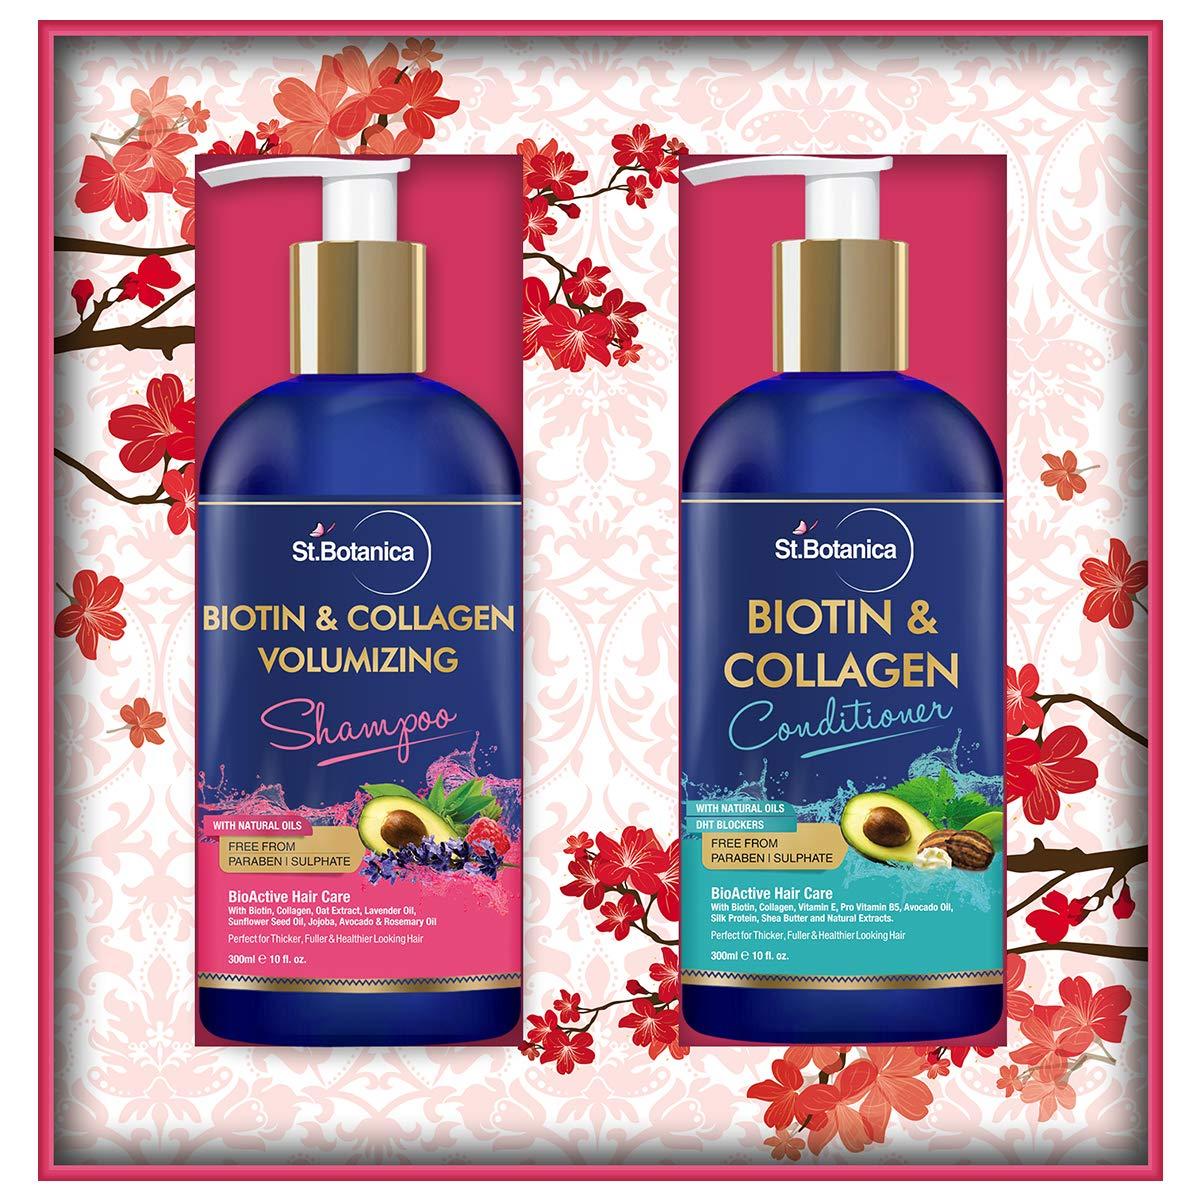 Amazon.com: Champú para el cabello StBotanica Biotin ...